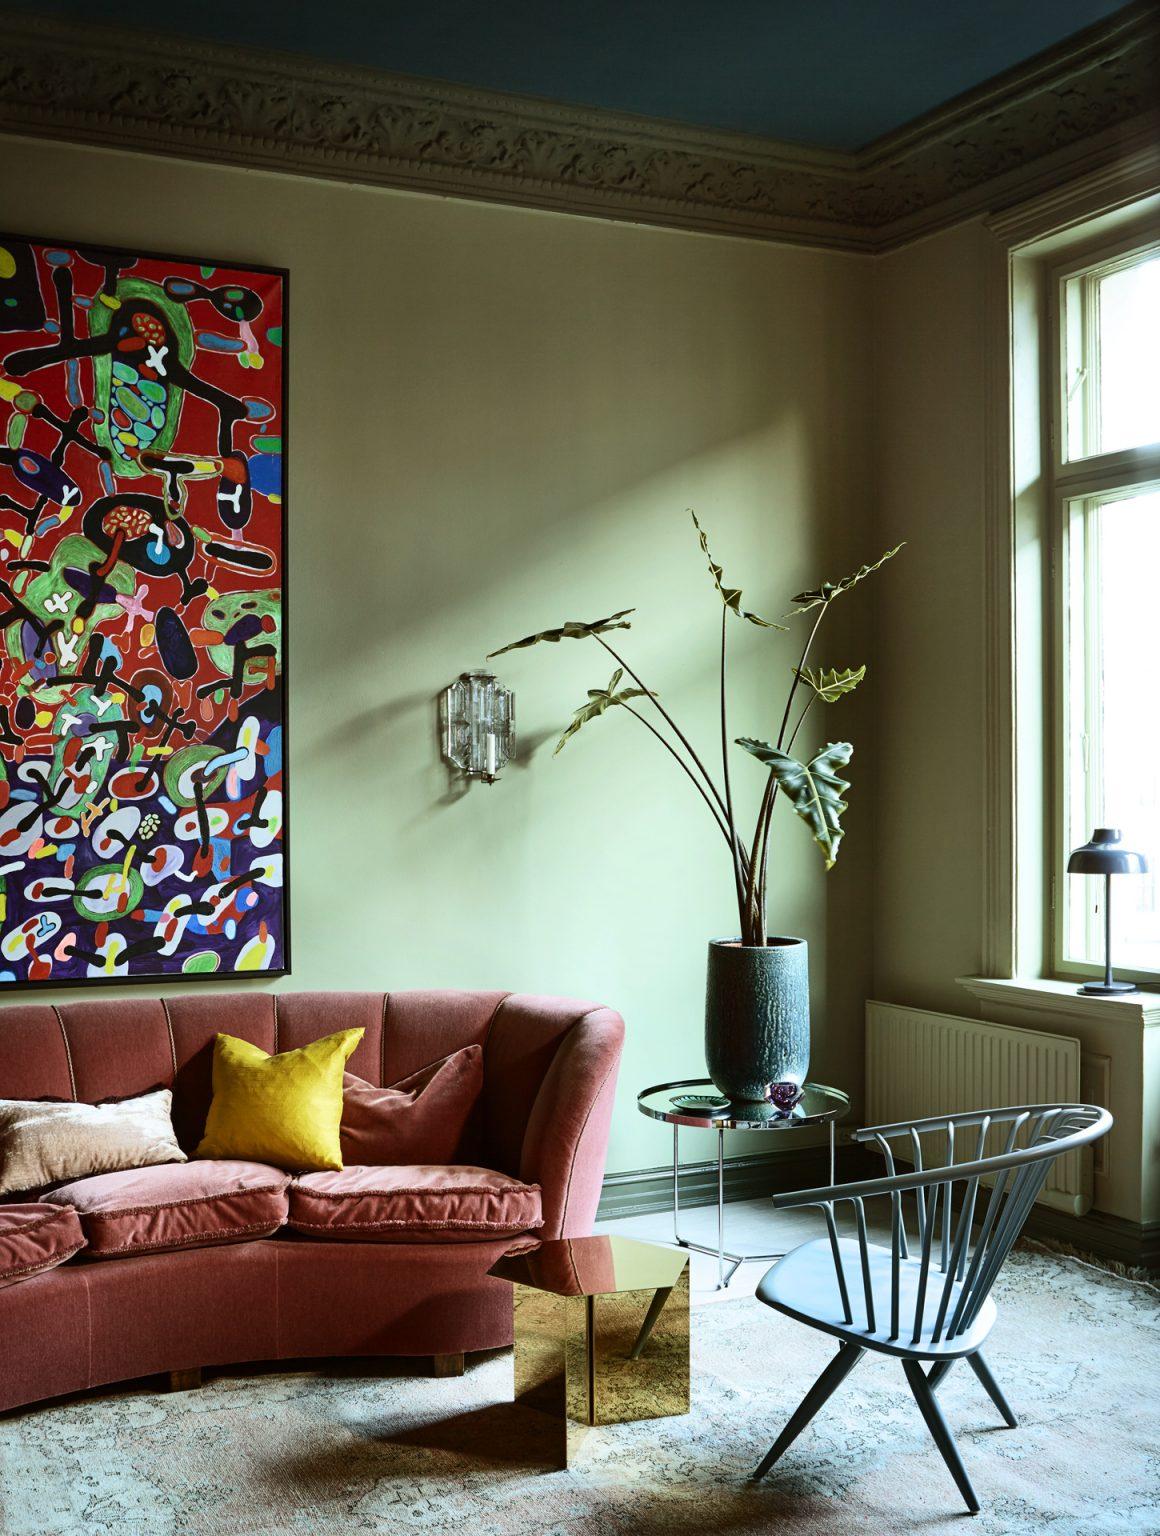 05_pure_original_landscape_walls_belgian_wilderness_moldings_steelblue_ceiling